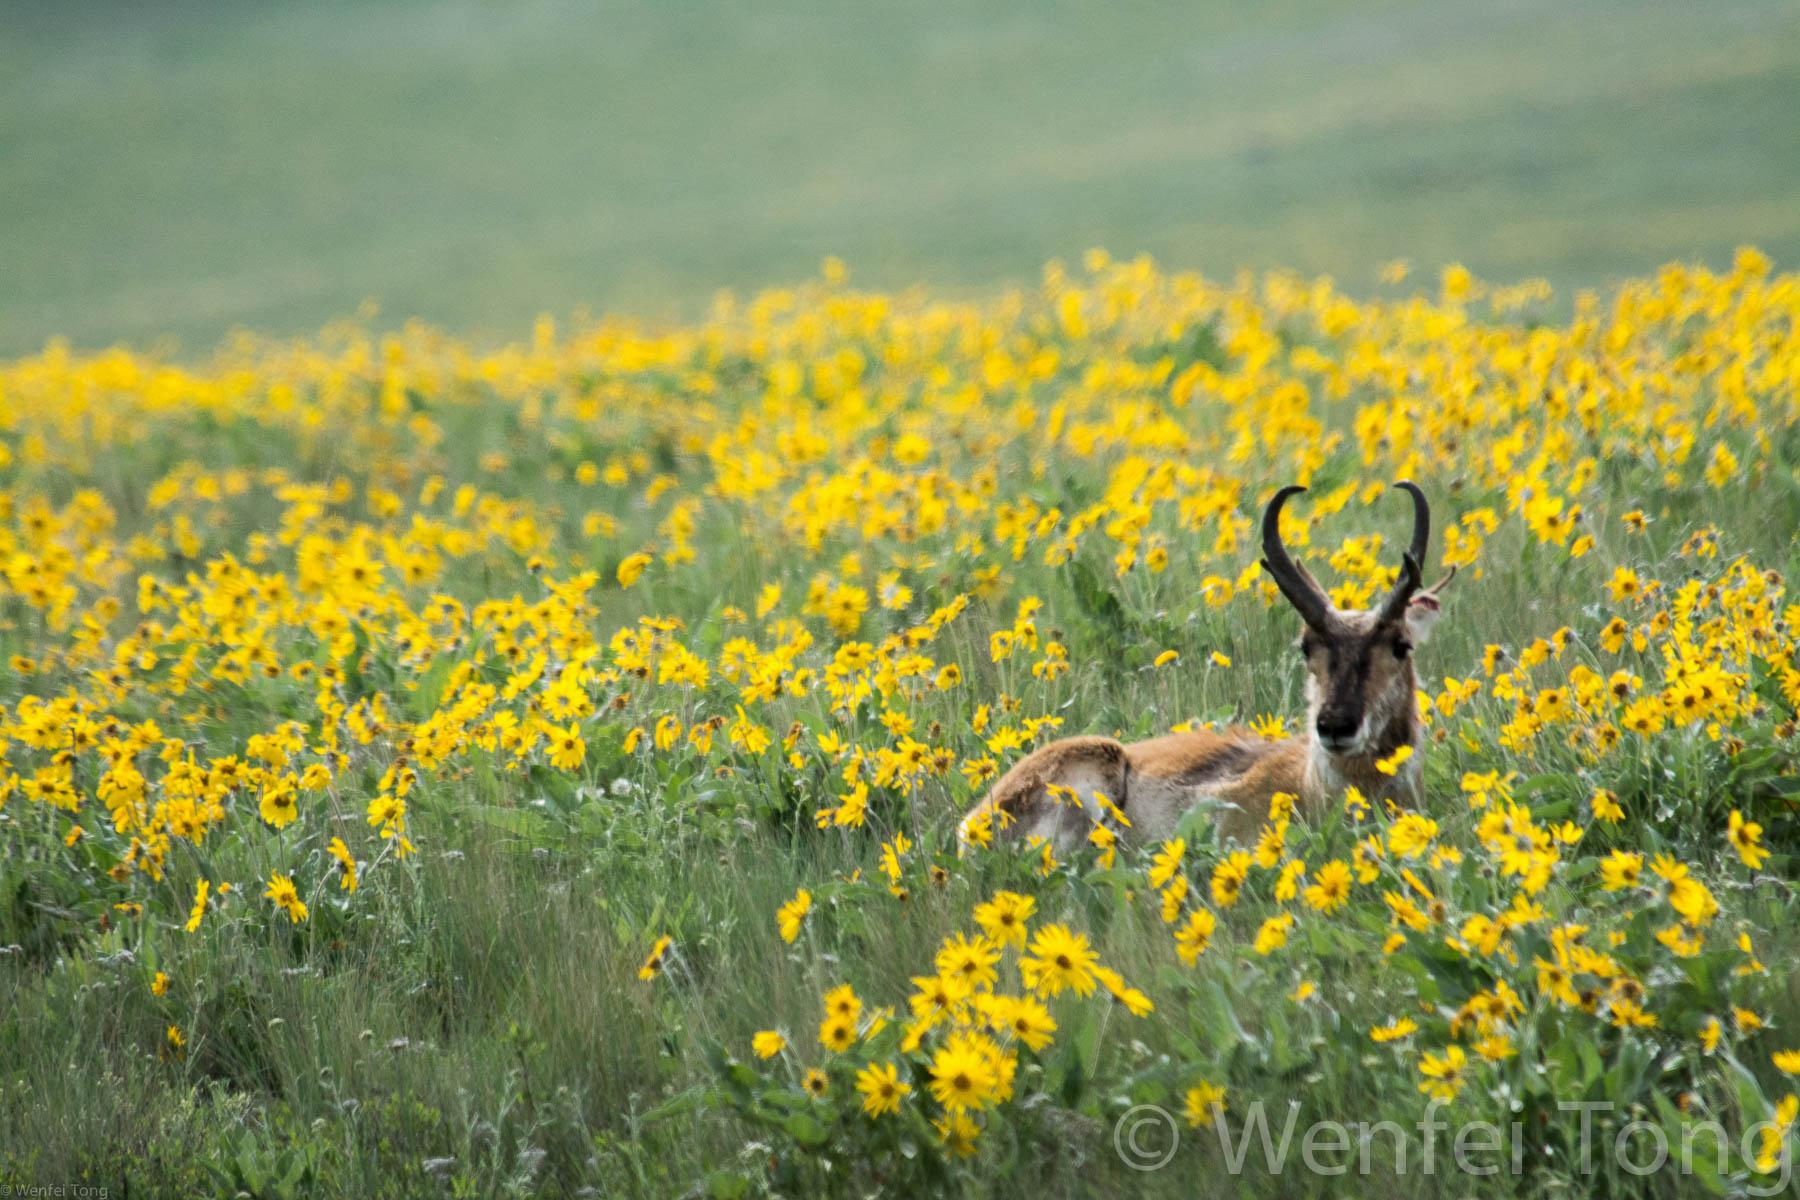 Pronghorn buck among the arrowleaf balsamroot